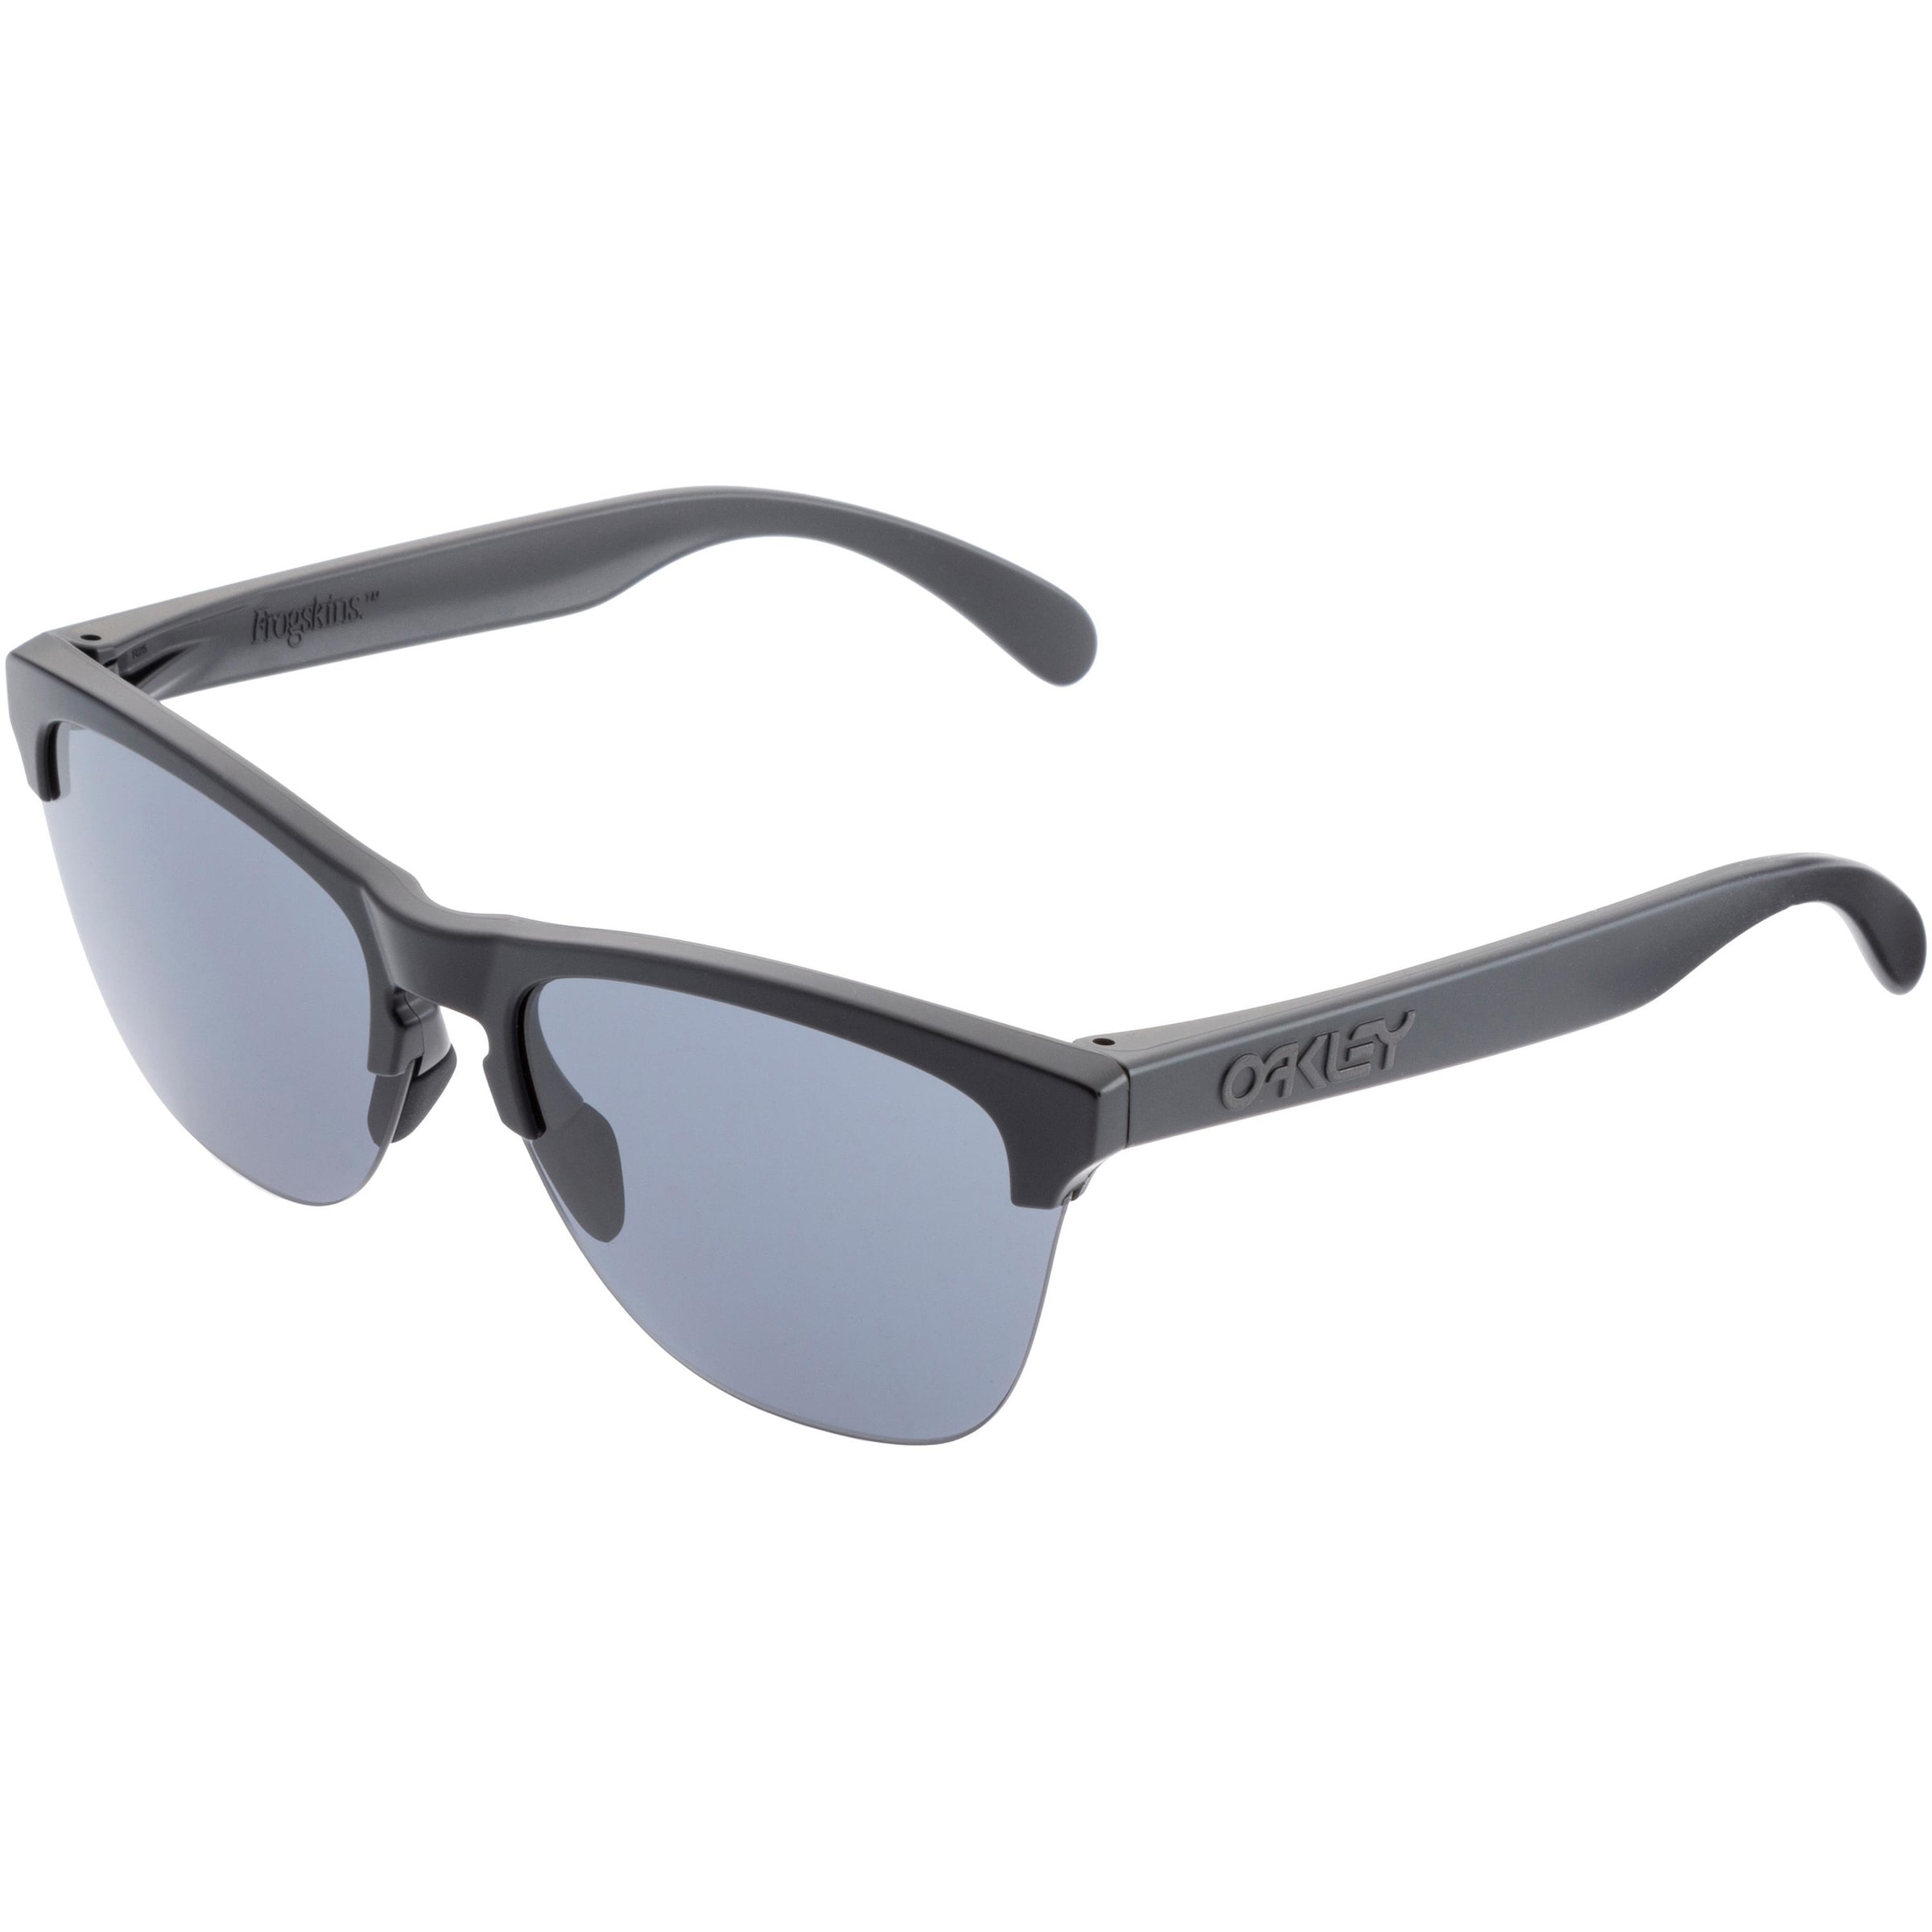 Oakley Schwarz Schwarz Oakley In In Sonnenbrille Sonnenbrille wvnm0N8